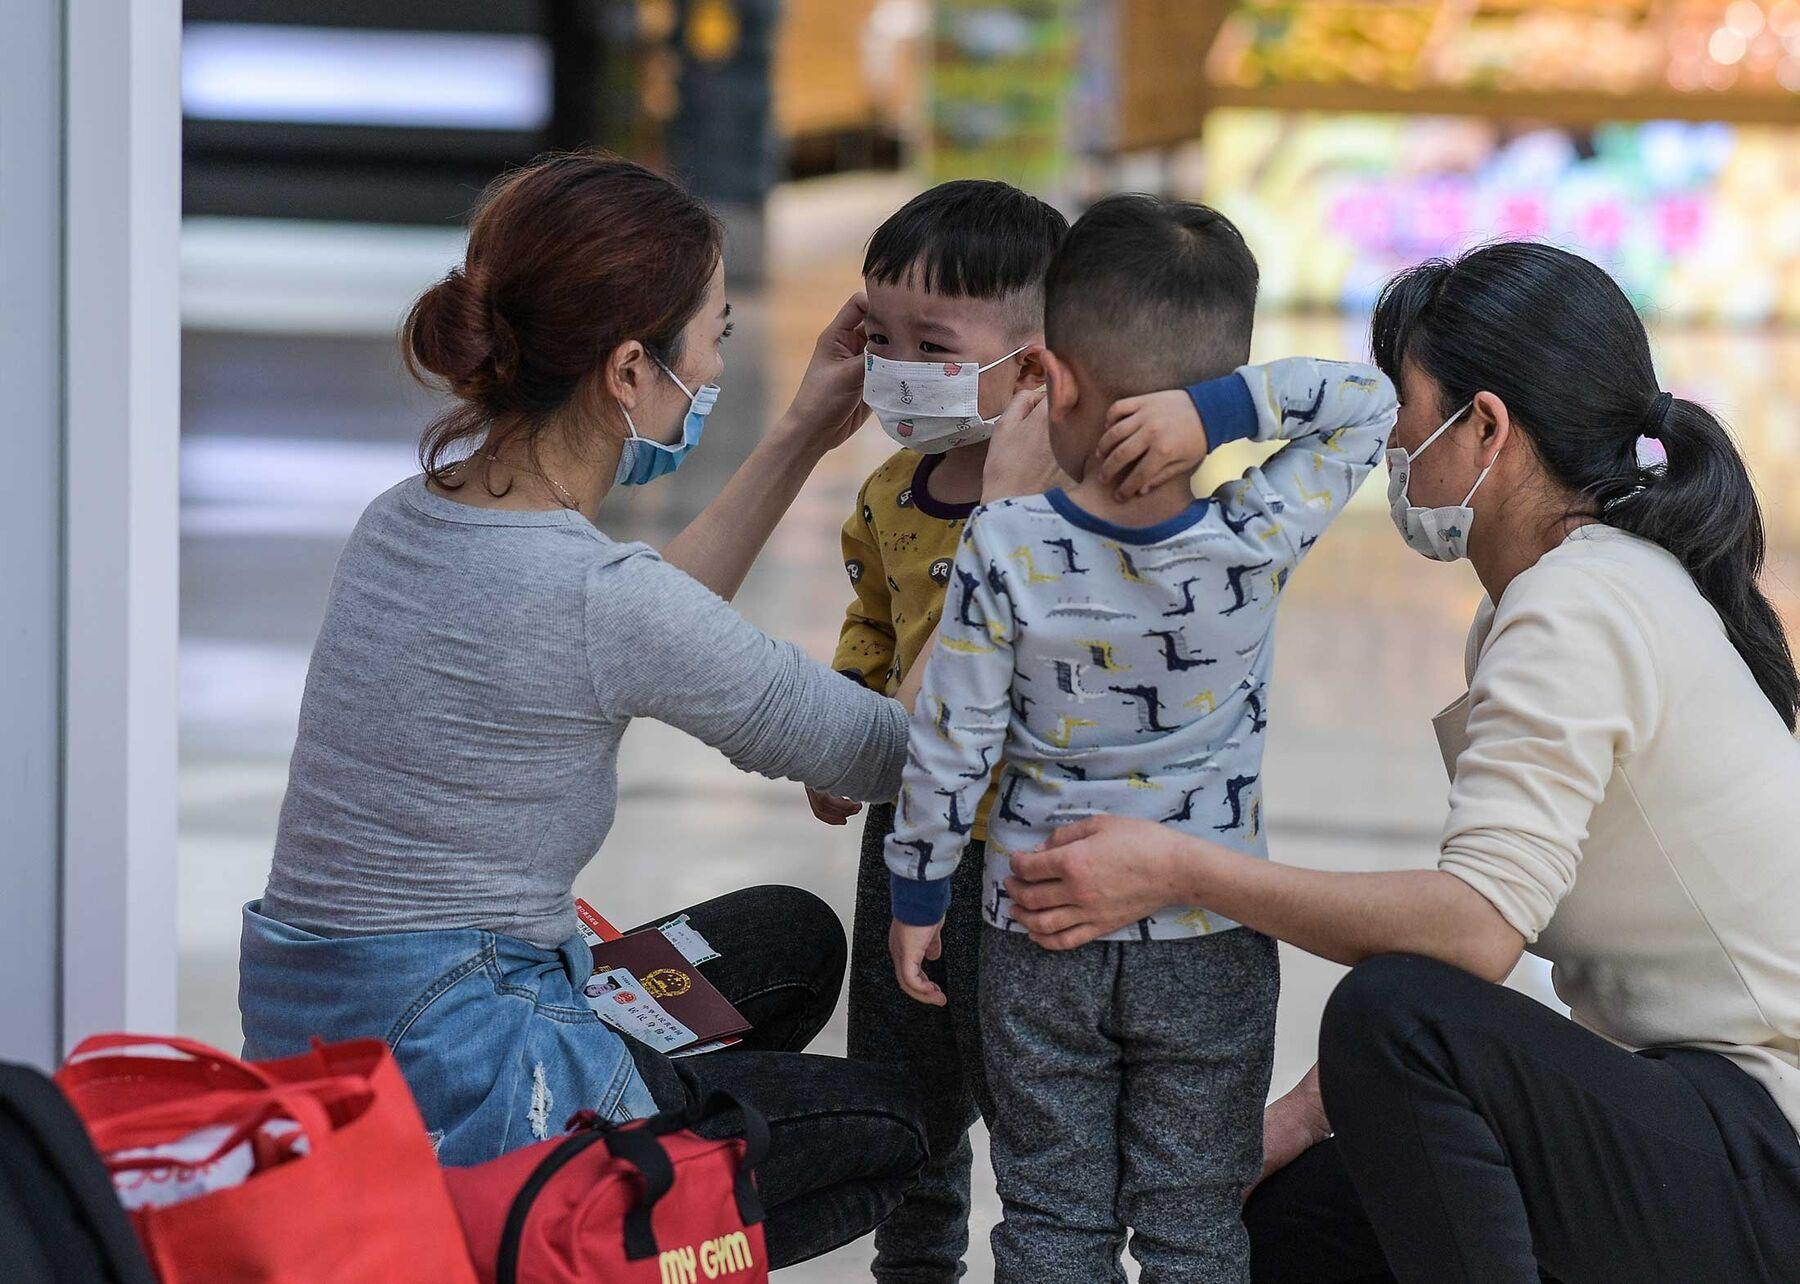 relates to Women Are Bearing the Brunt of Coronavirus Disruption